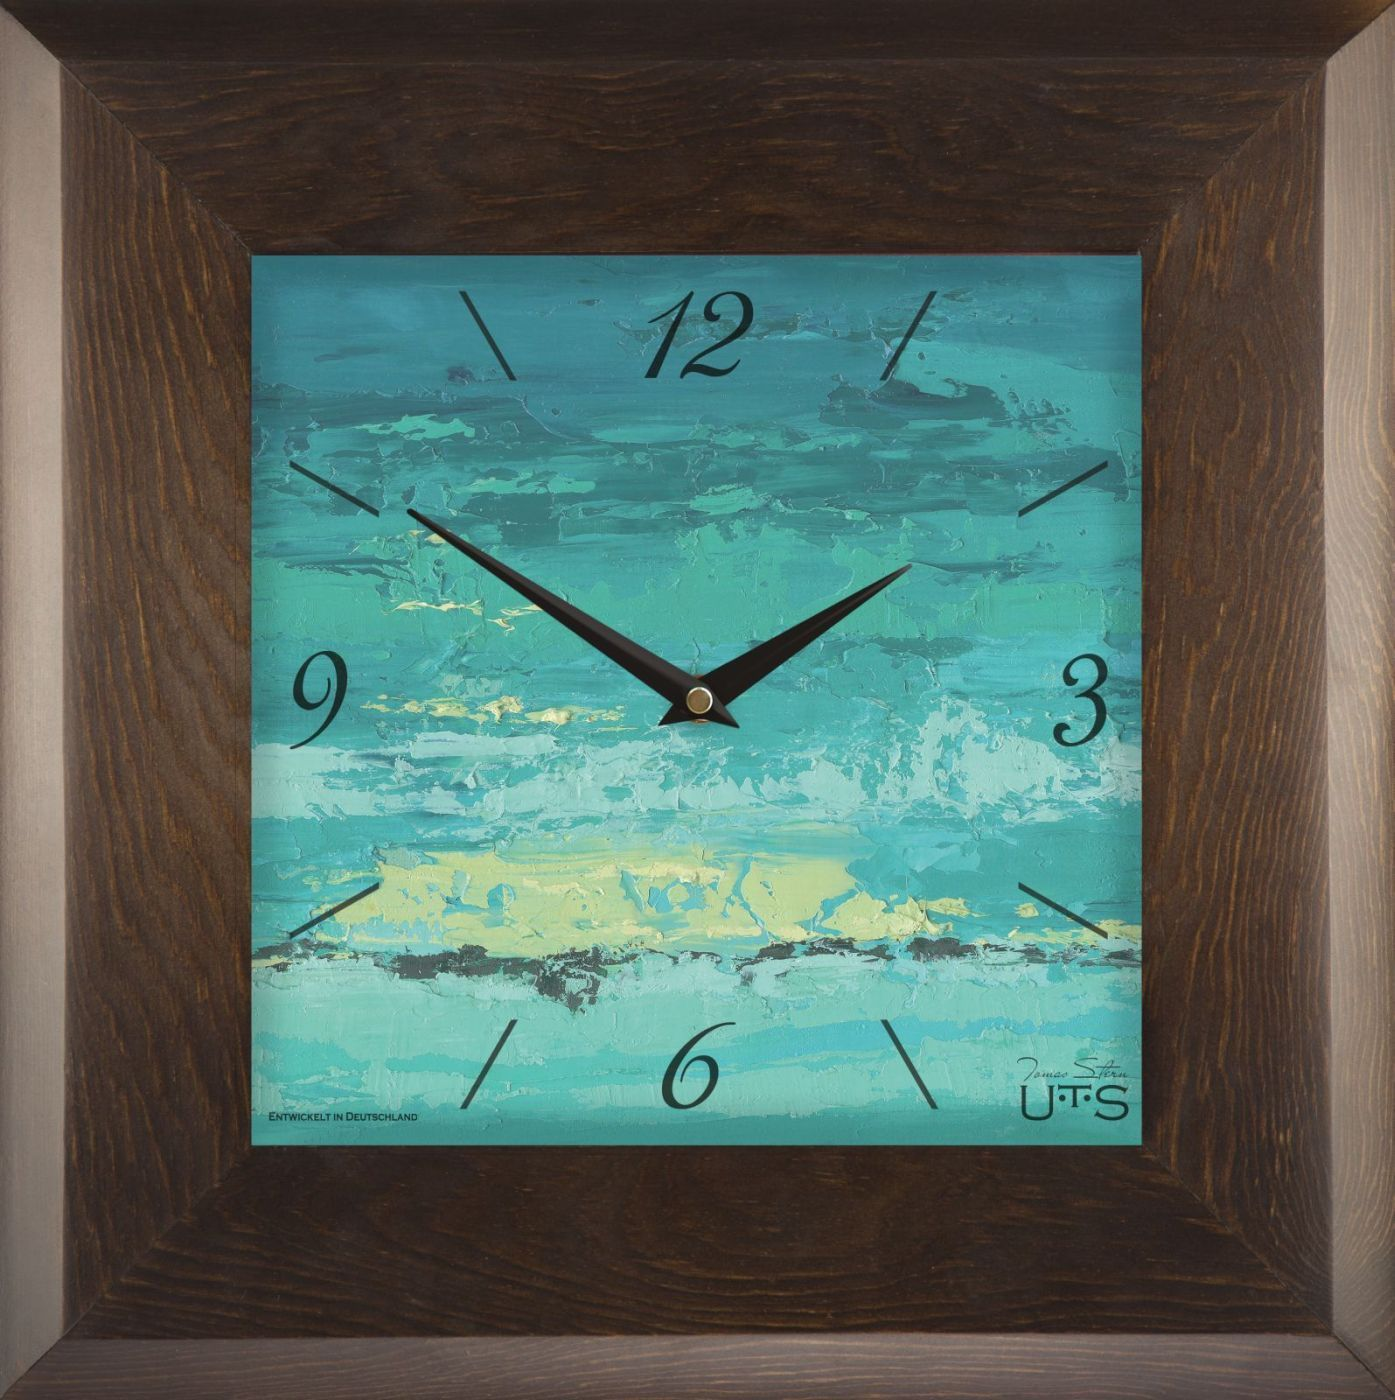 Часы настенные Часы настенные Tomas Stern 7013 chasy-nastennye-tomas-stern-7013-germaniya-tayvan.jpg